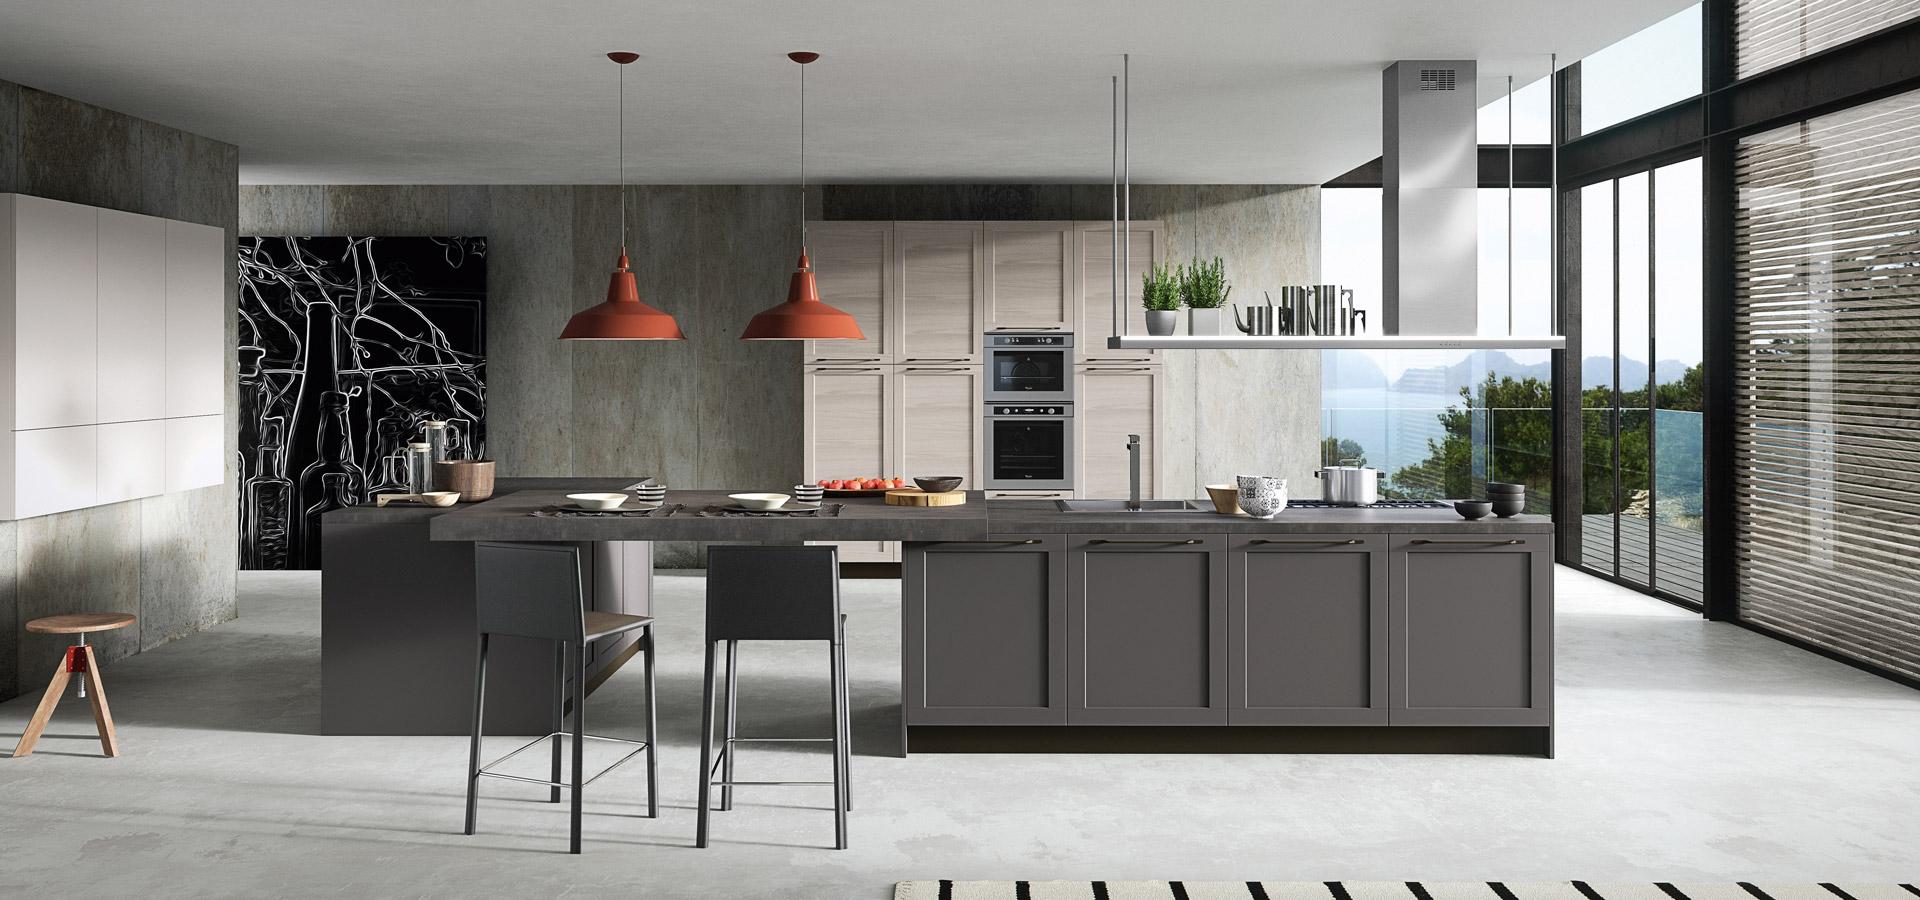 Итальянская кухня модерн FRAME | Кухня FRAME ARREDO3